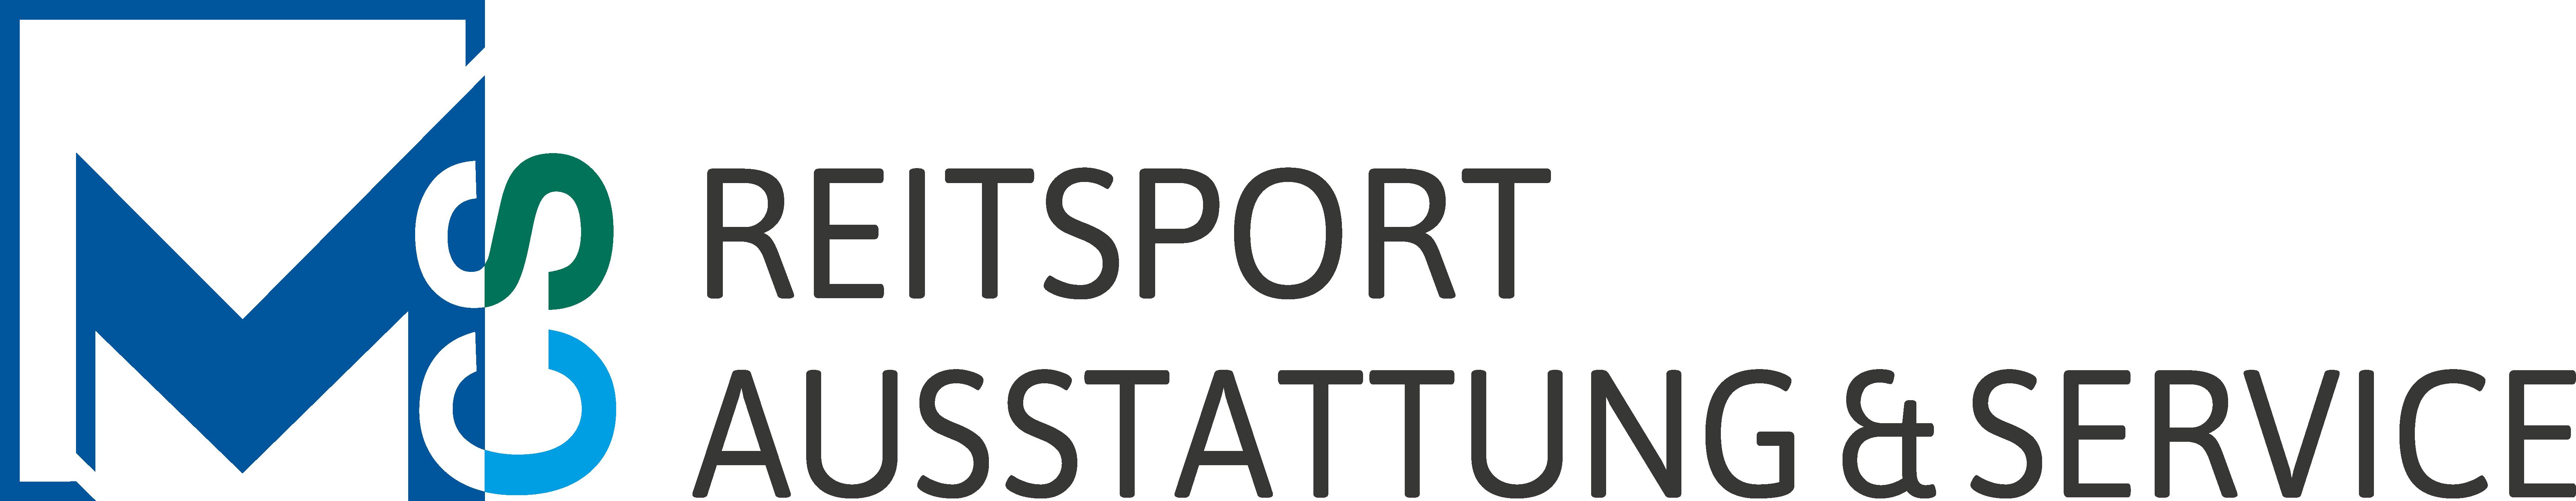 MCS Logo Pferdesport